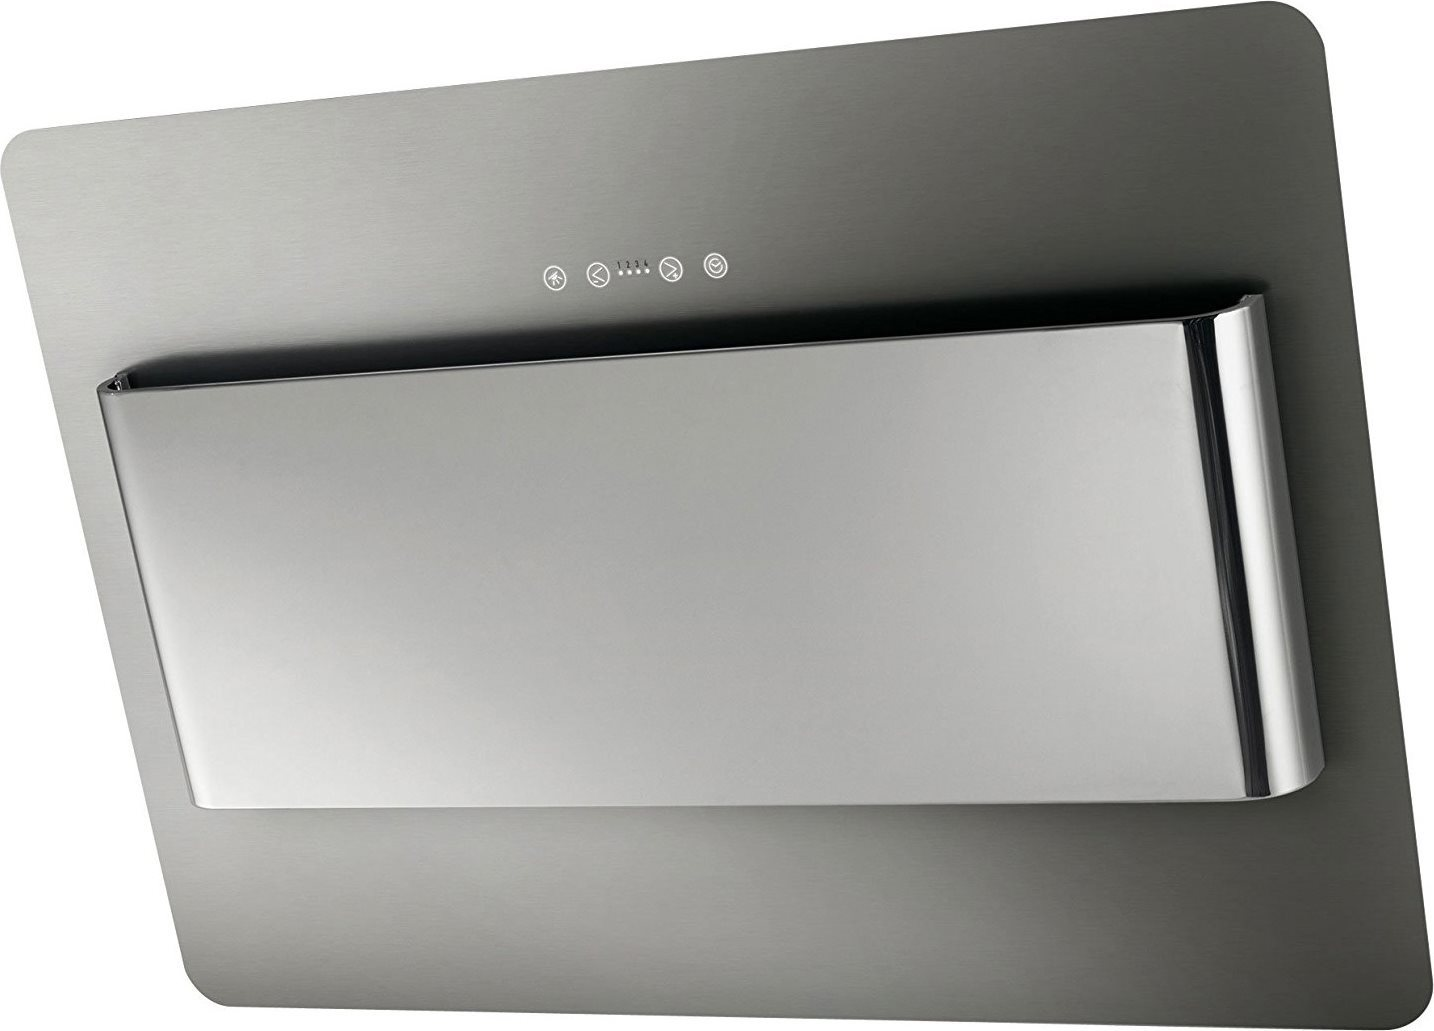 Cappa Elica BELT IX/F/80 - PRF0033852 - Cappa cucina 80 cm filtrante ...